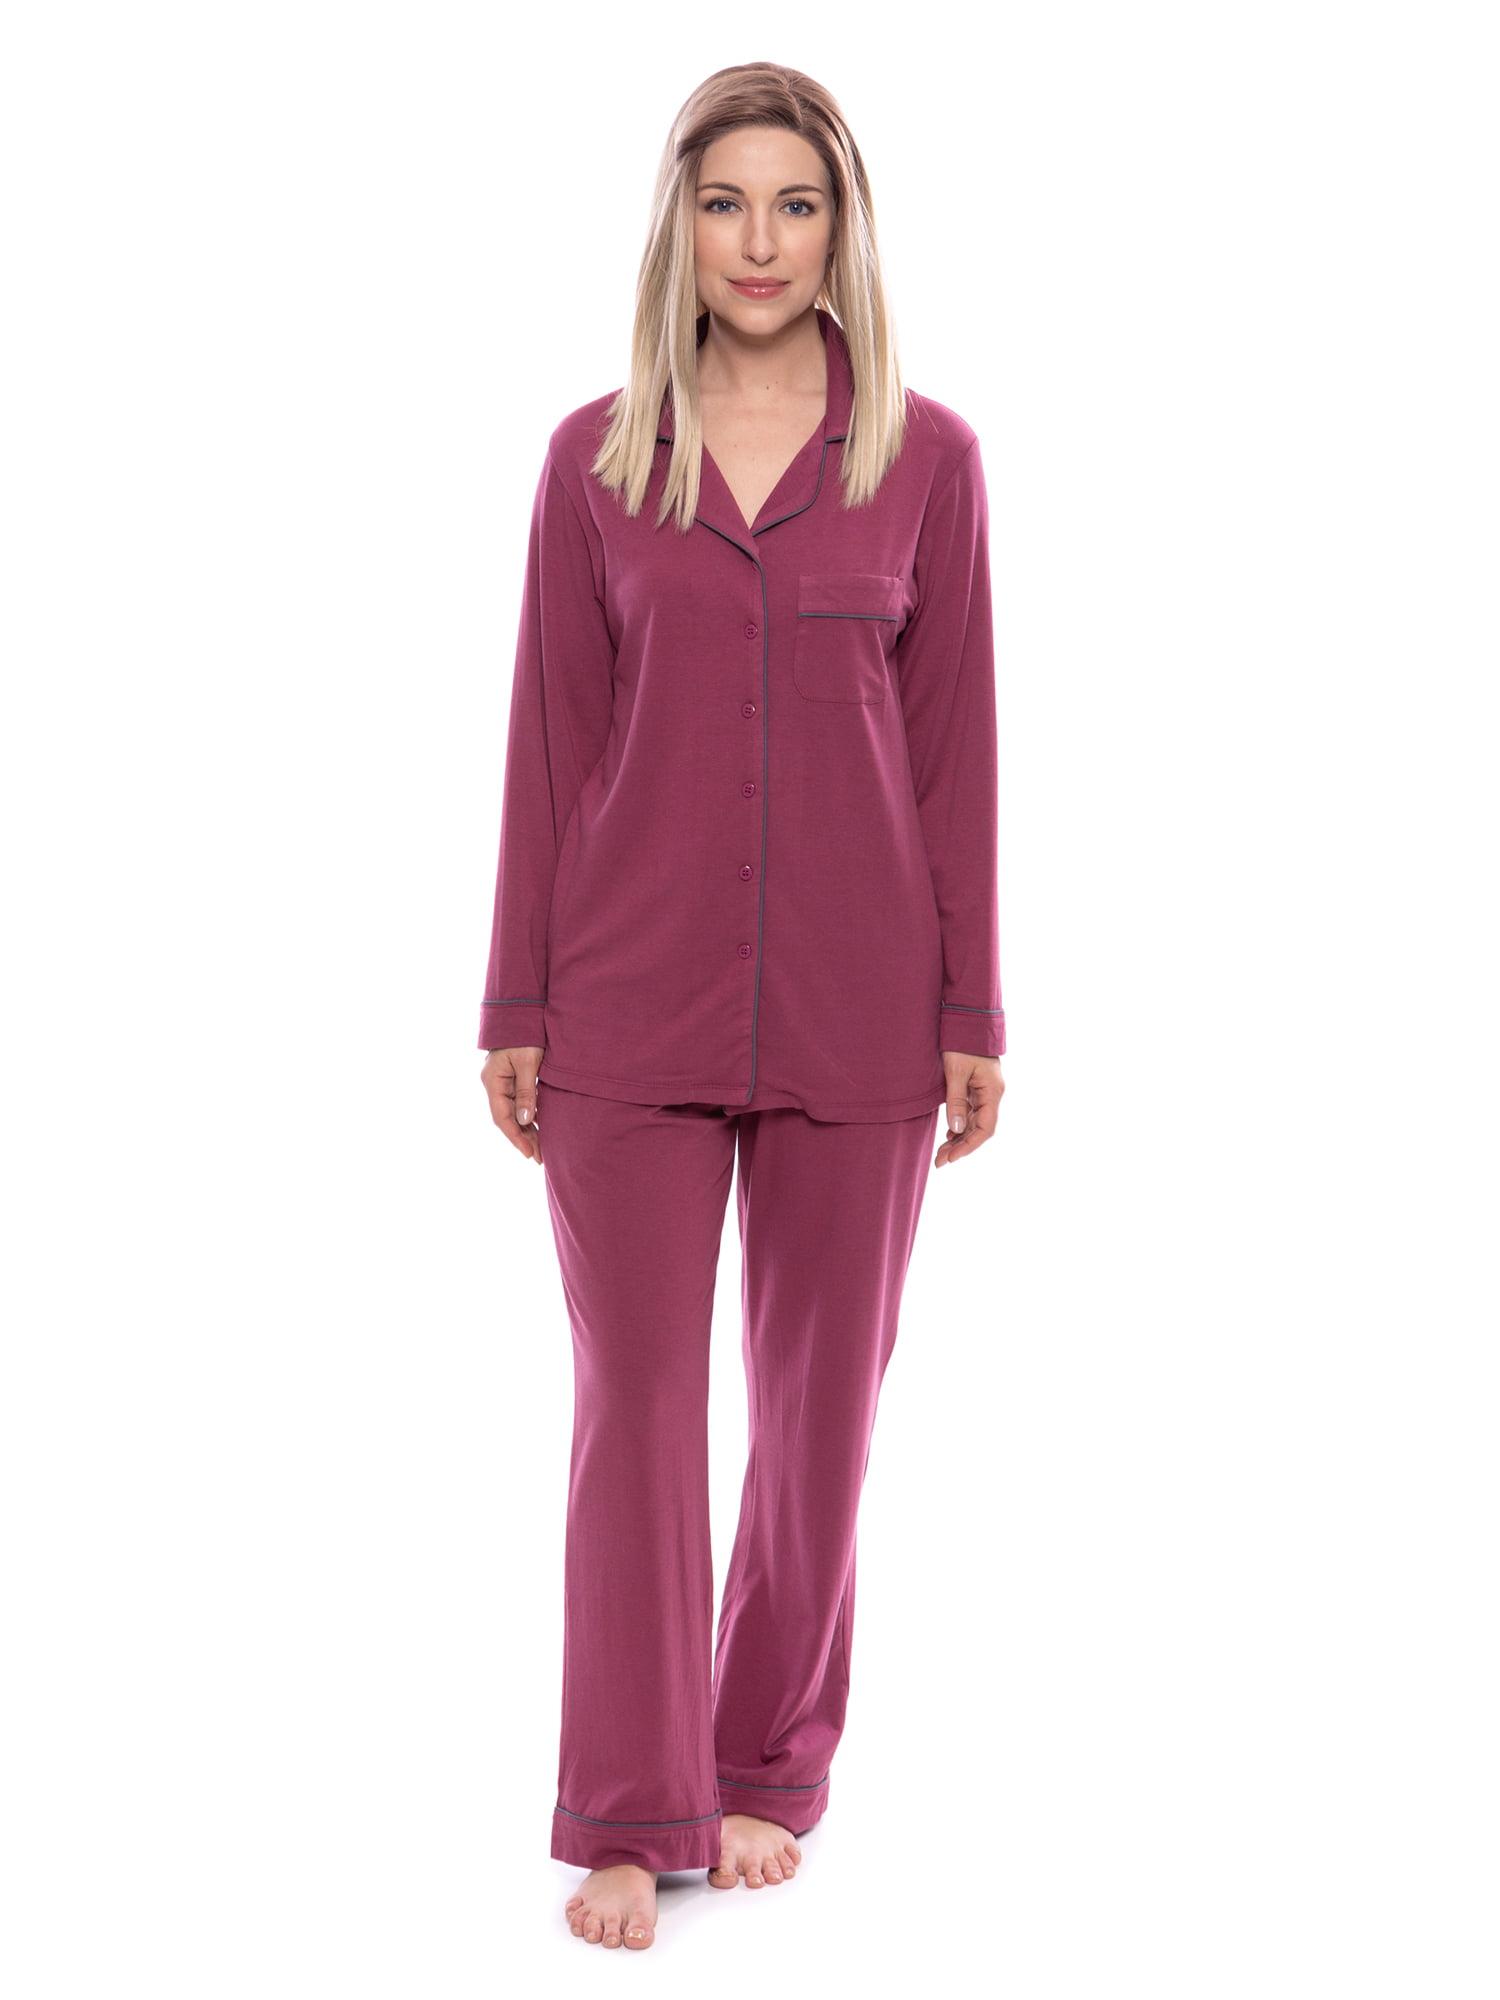 Women's Button-Up Long Sleeve Pajamas - Sleepwear set by Texere (Classicomfort)